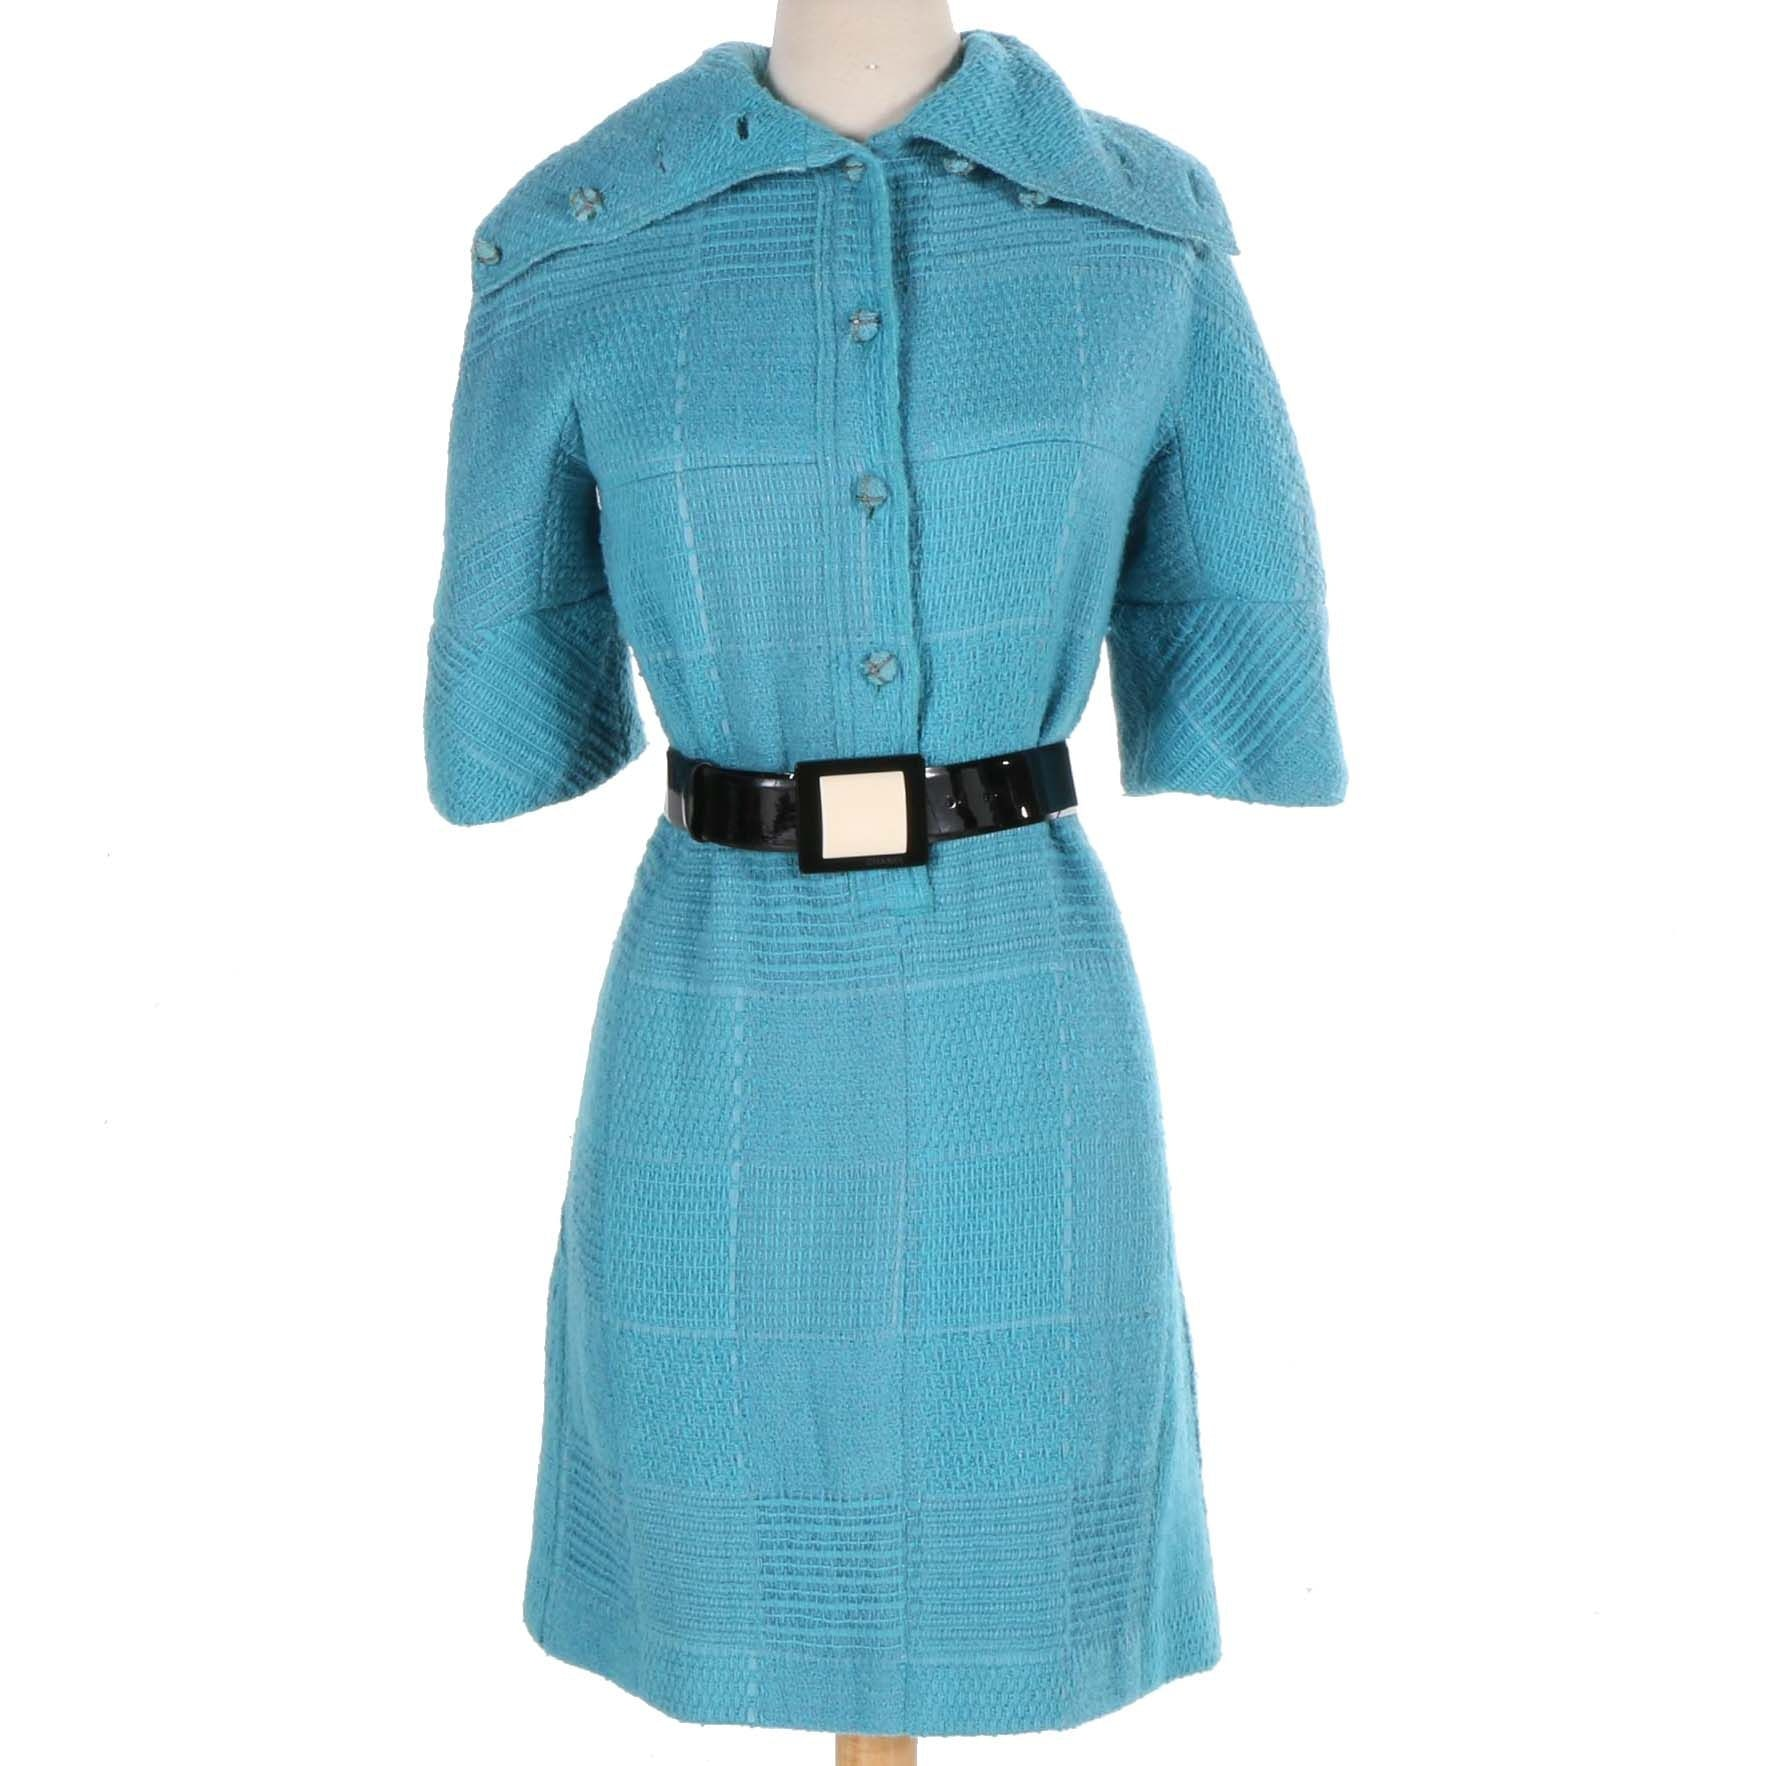 Chanel Blue Knit Dress